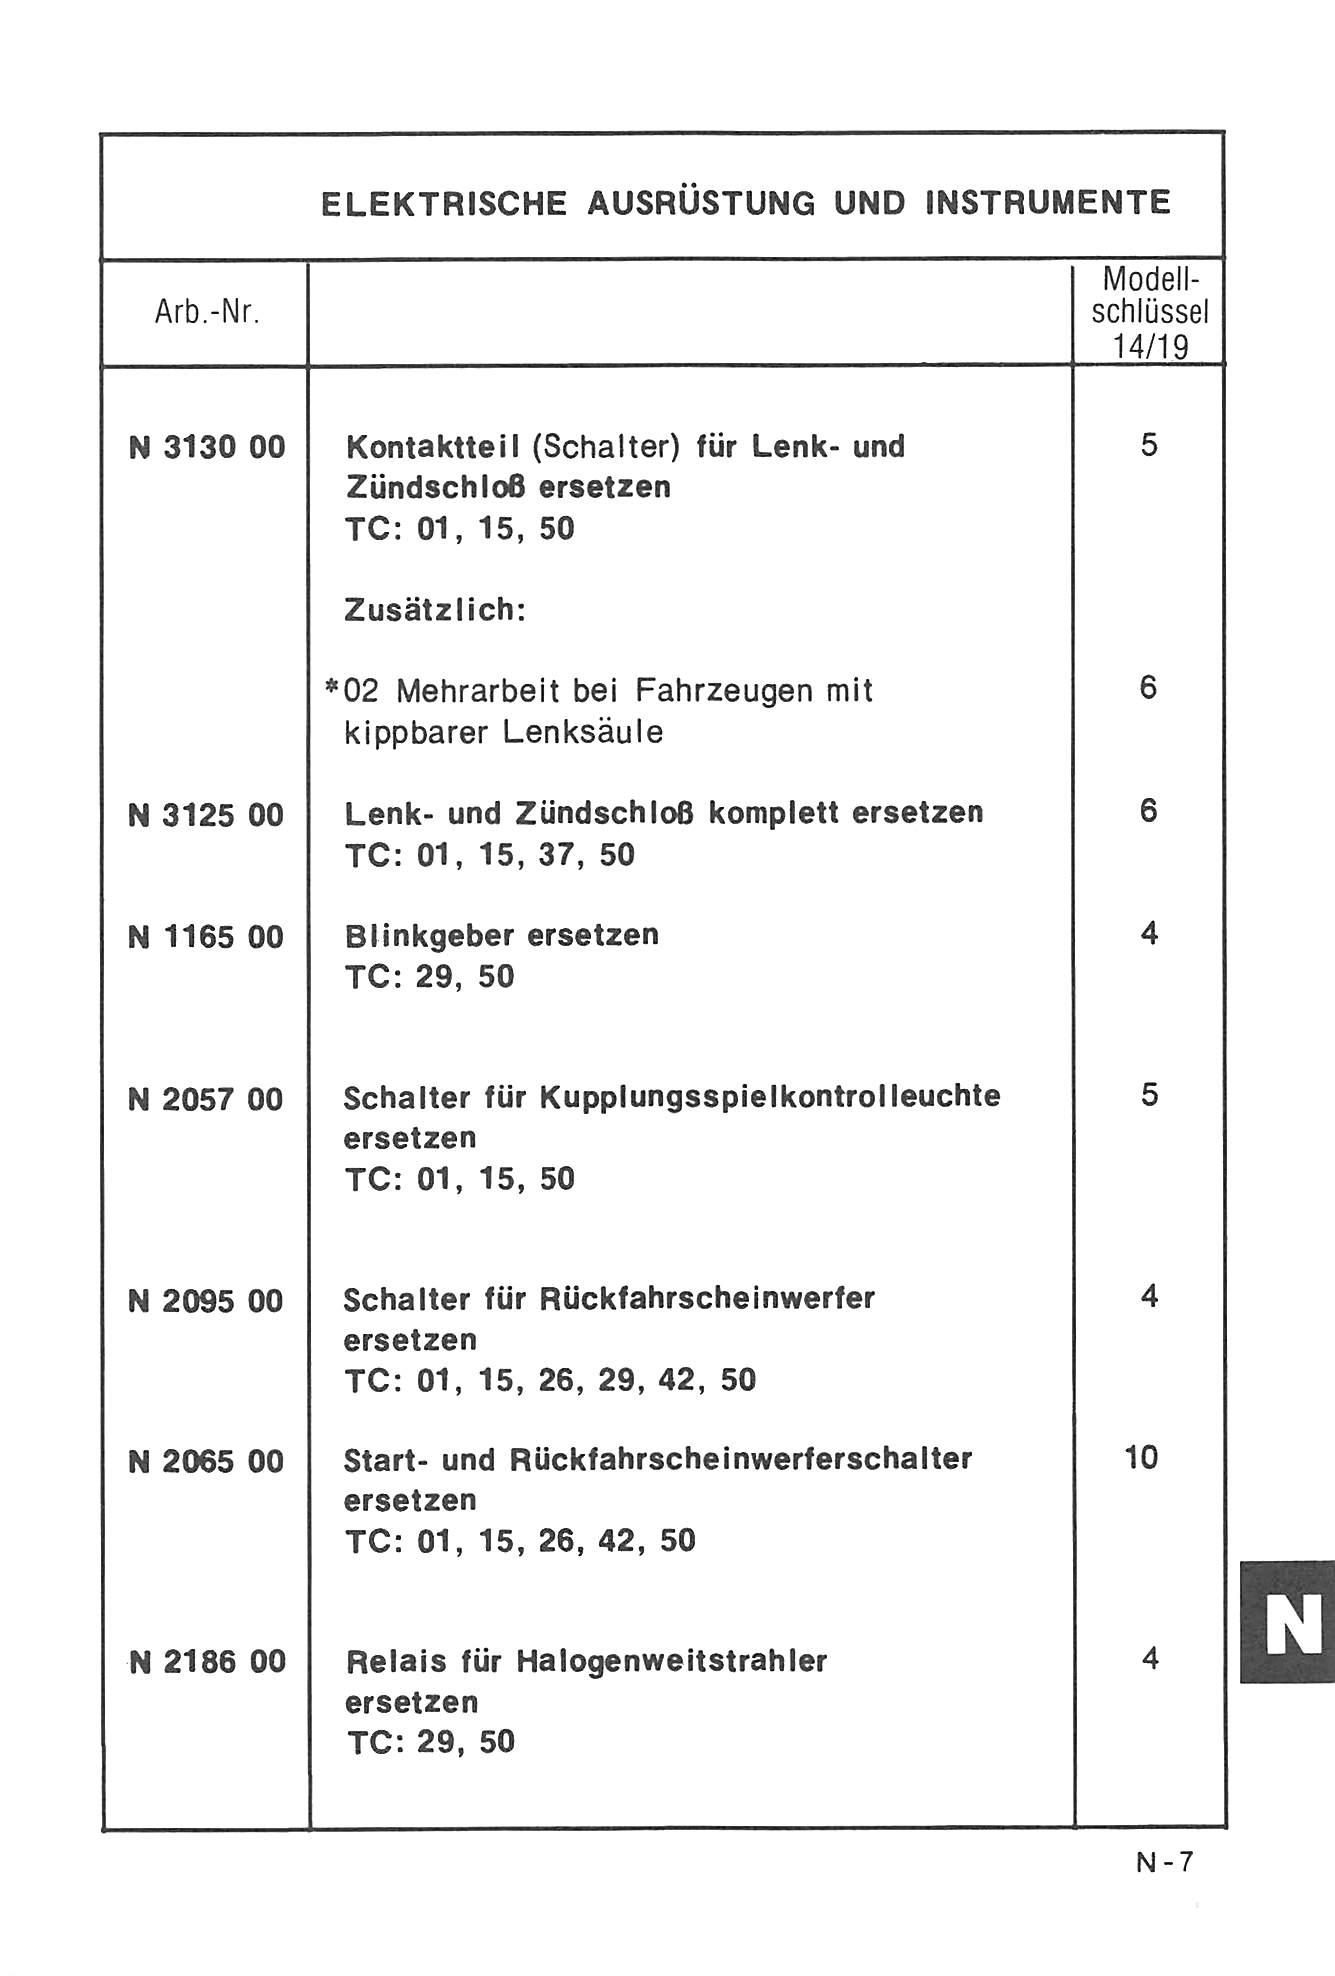 Berühmt Wie Man Den Elektrischen Unterbrecherschalter Ersetzt ...